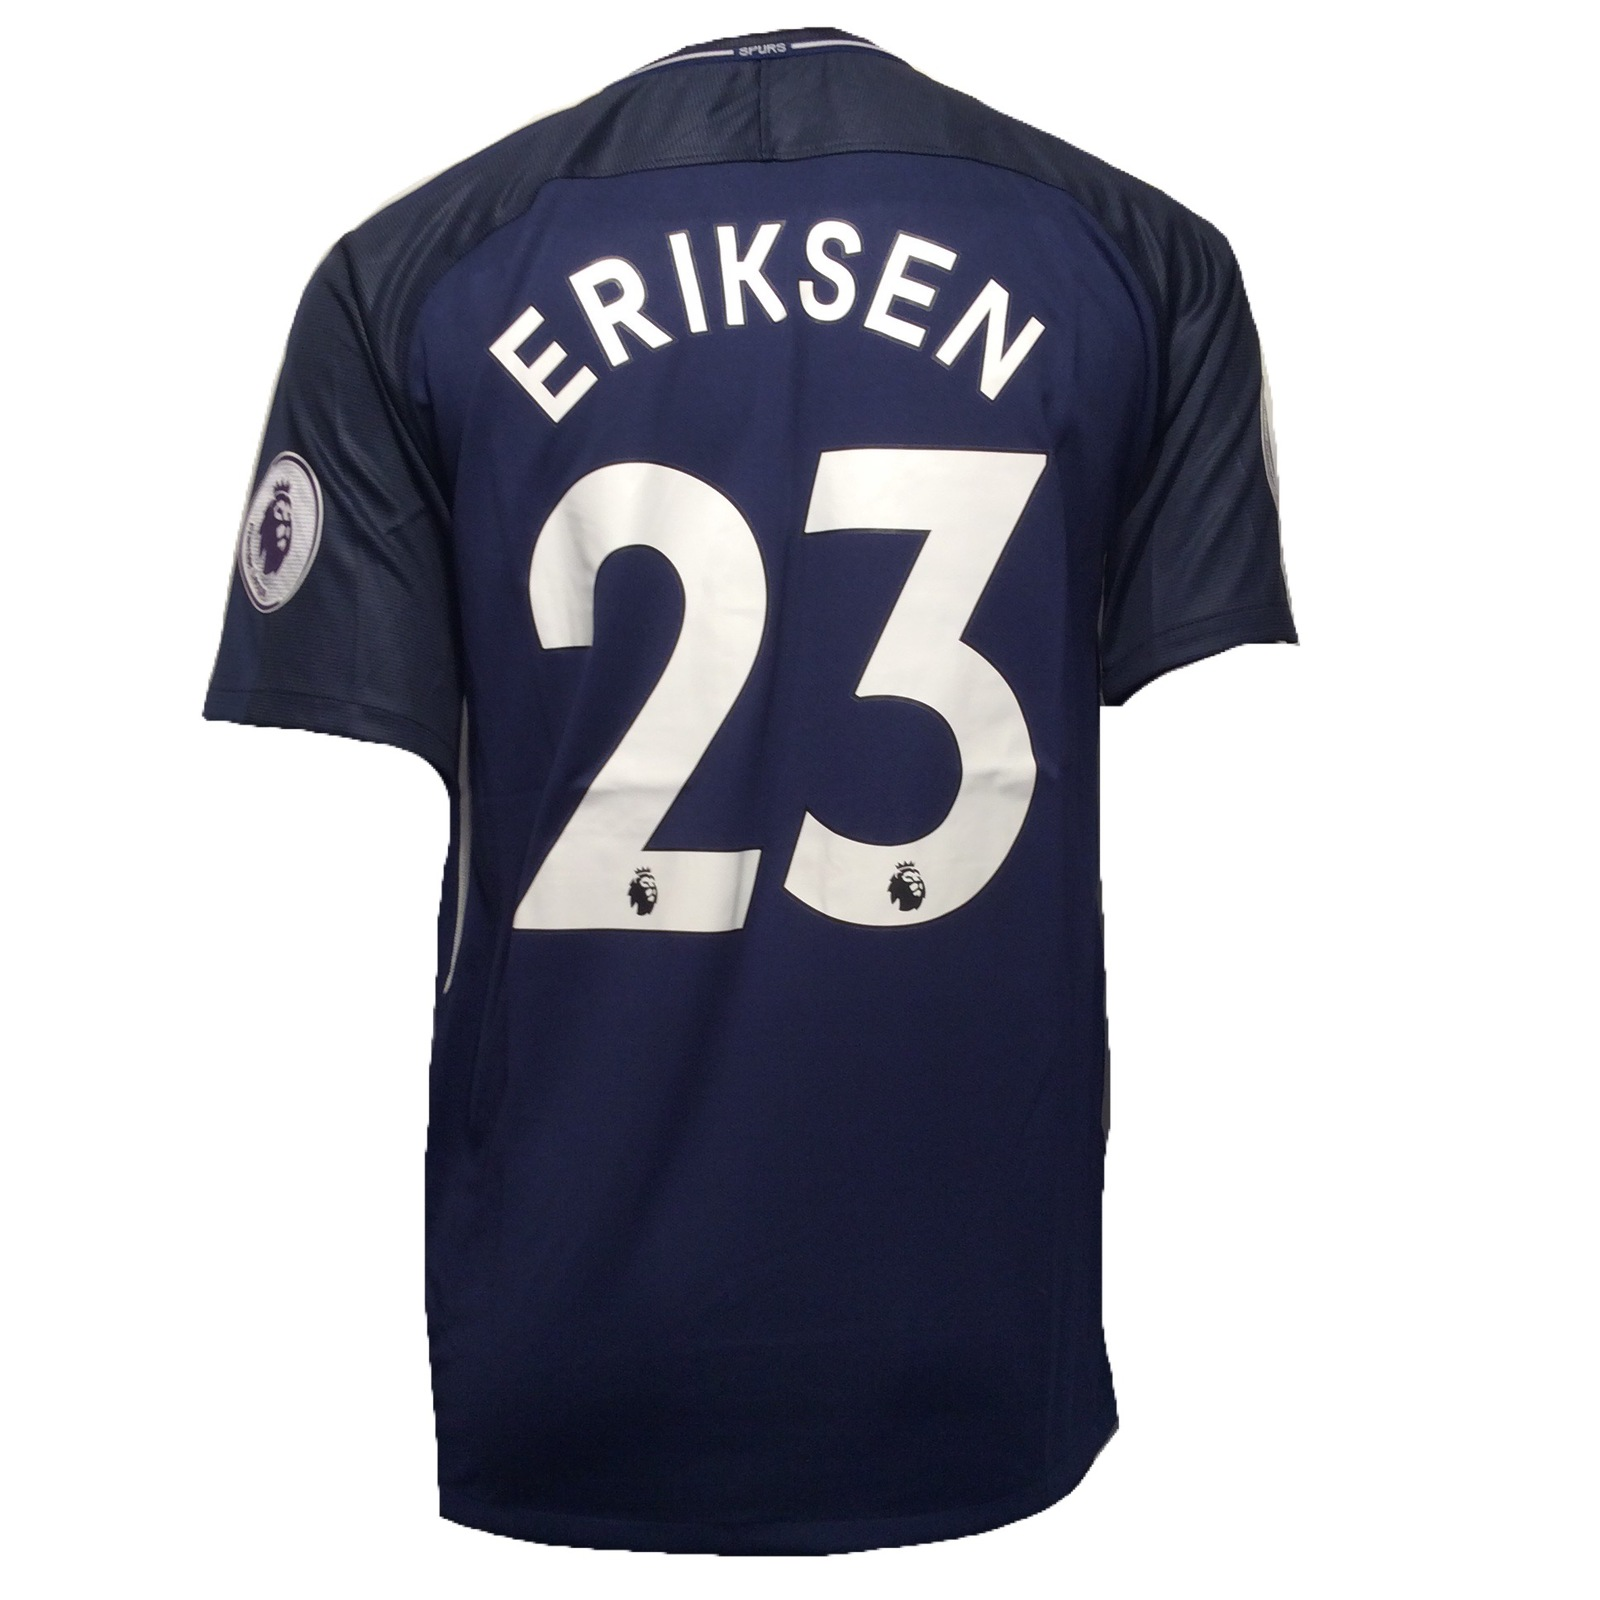 778d0f6700a 2017-18 Tottenham Christian Eriksen  23 and 50 similar items